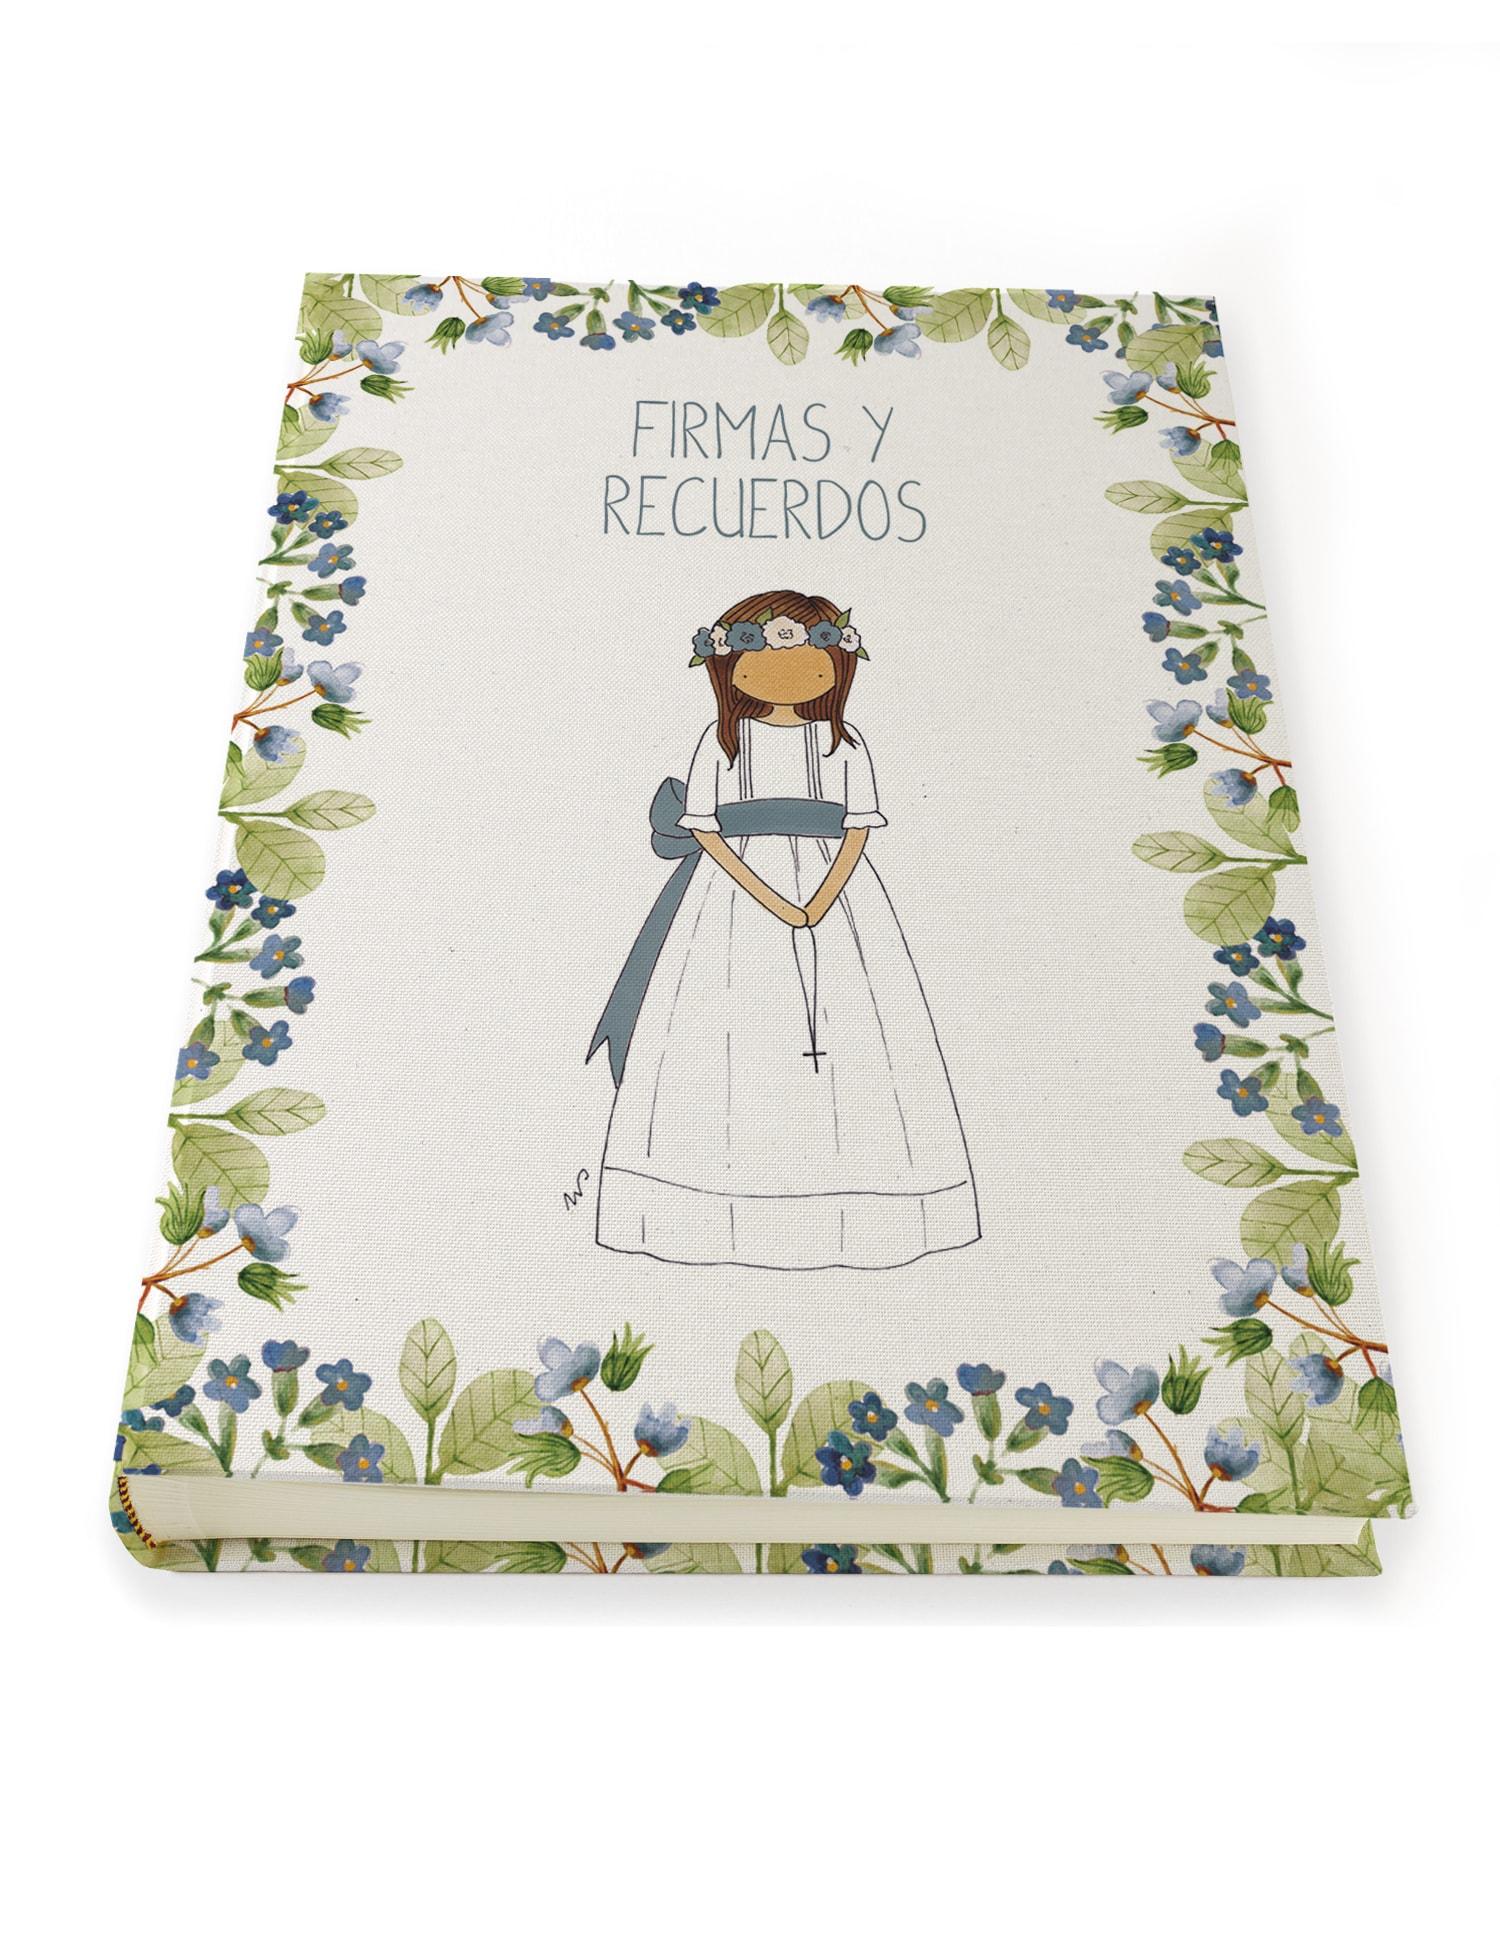 A3 NÑA9 PETIFLOR AZUL min - Libro de Firmas Clara Petit Flor Azul